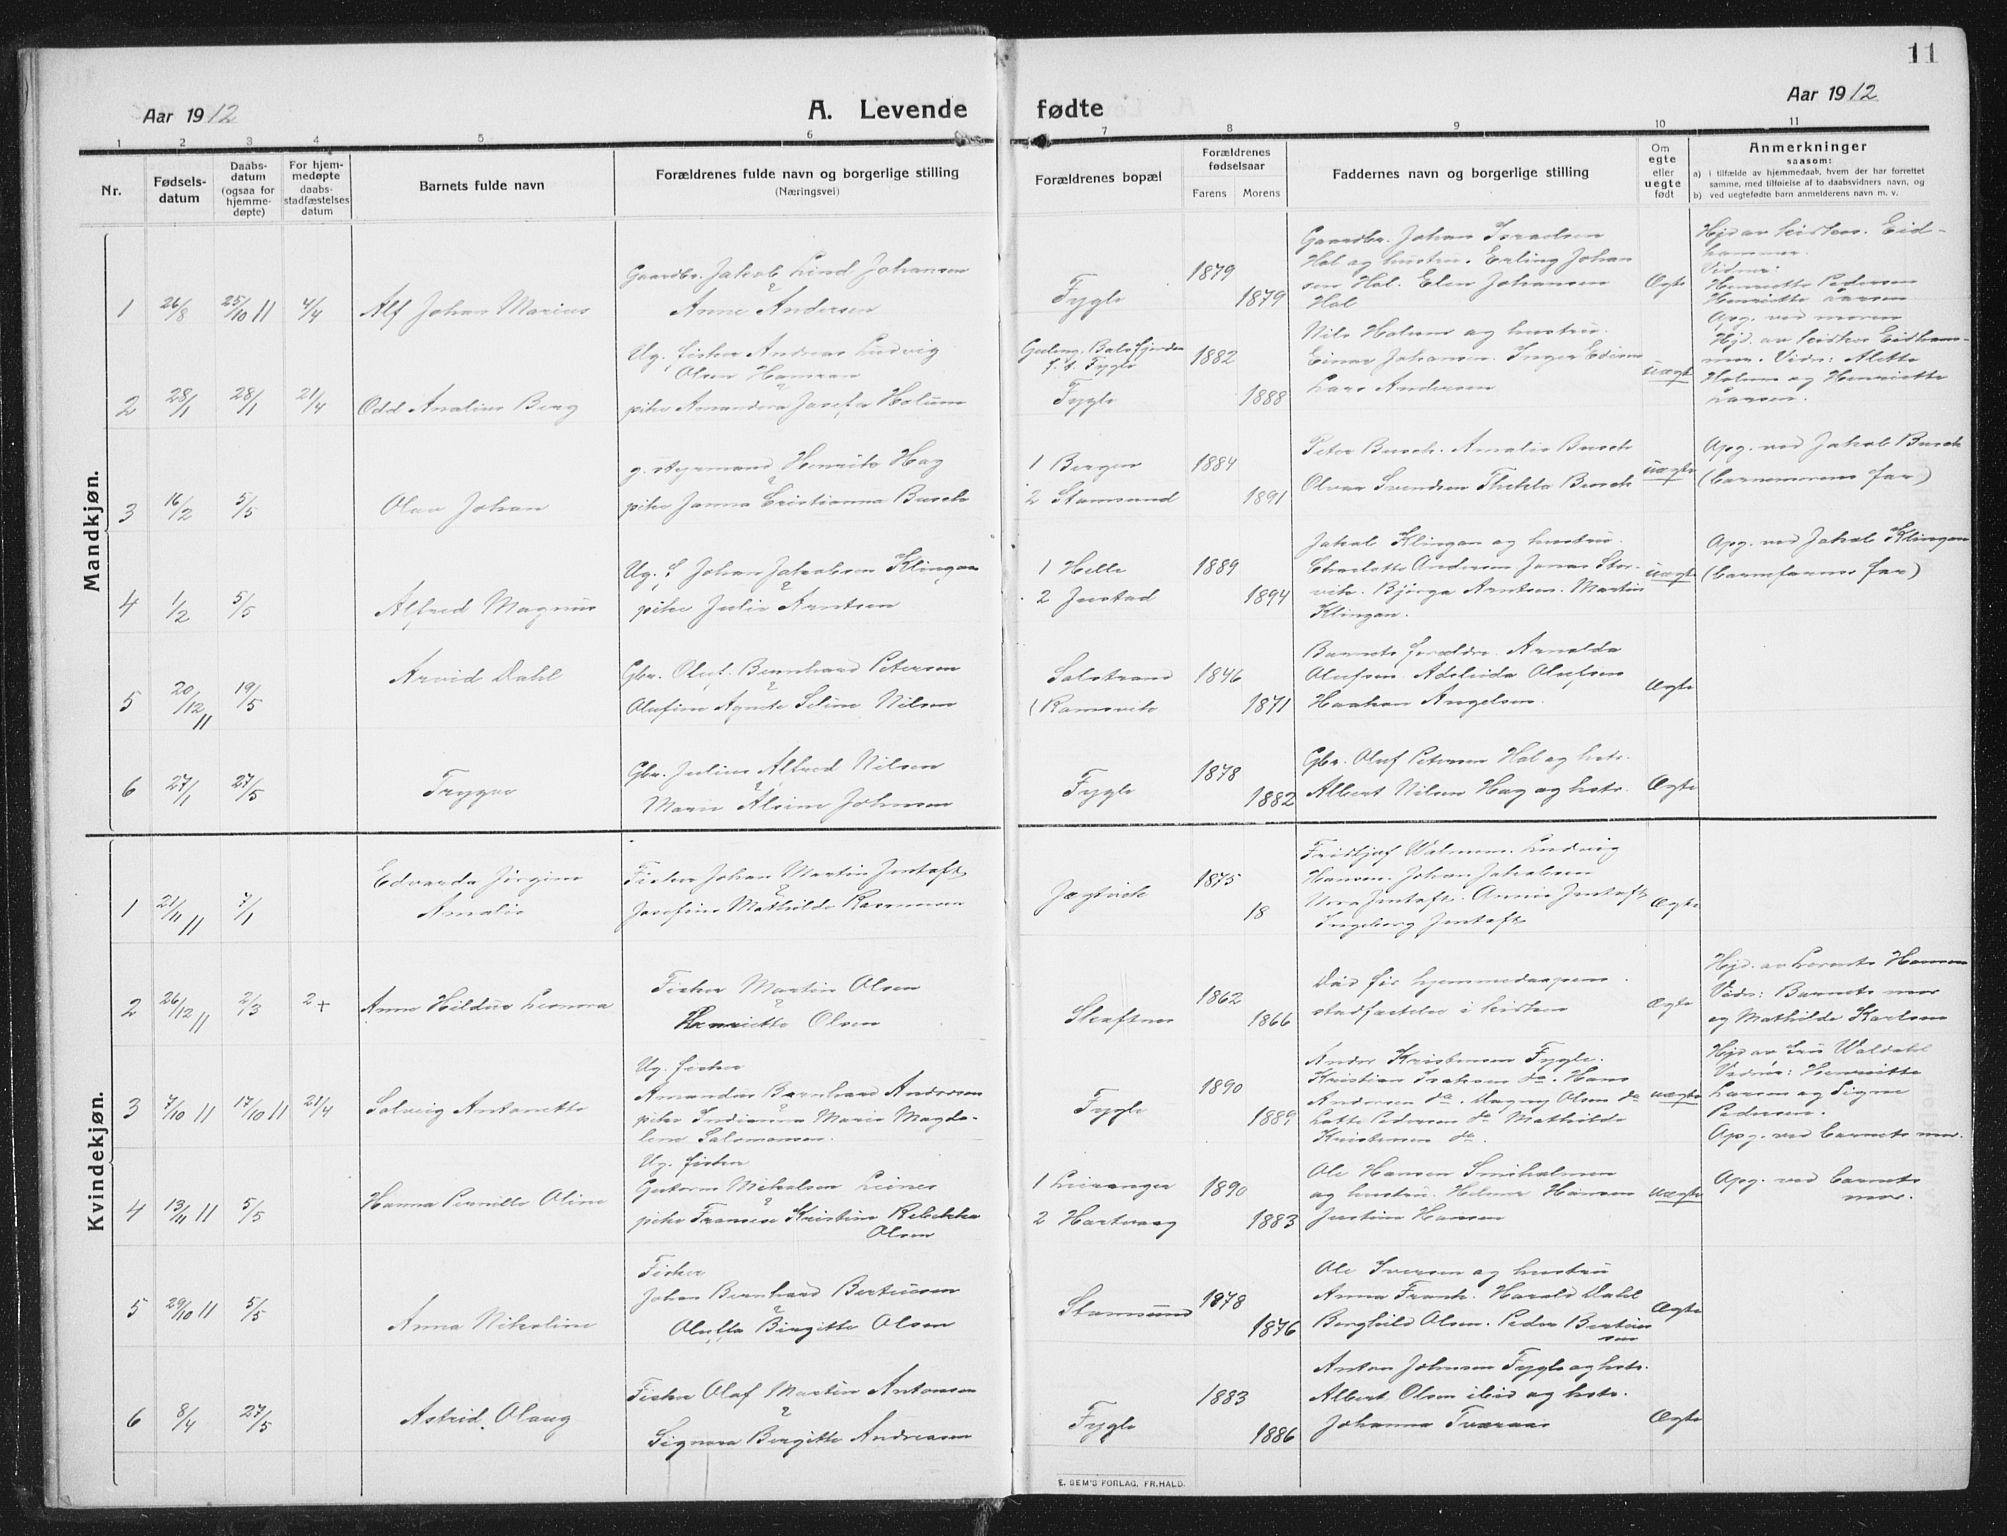 SAT, Ministerialprotokoller, klokkerbøker og fødselsregistre - Nordland, 882/L1183: Klokkerbok nr. 882C01, 1911-1938, s. 11